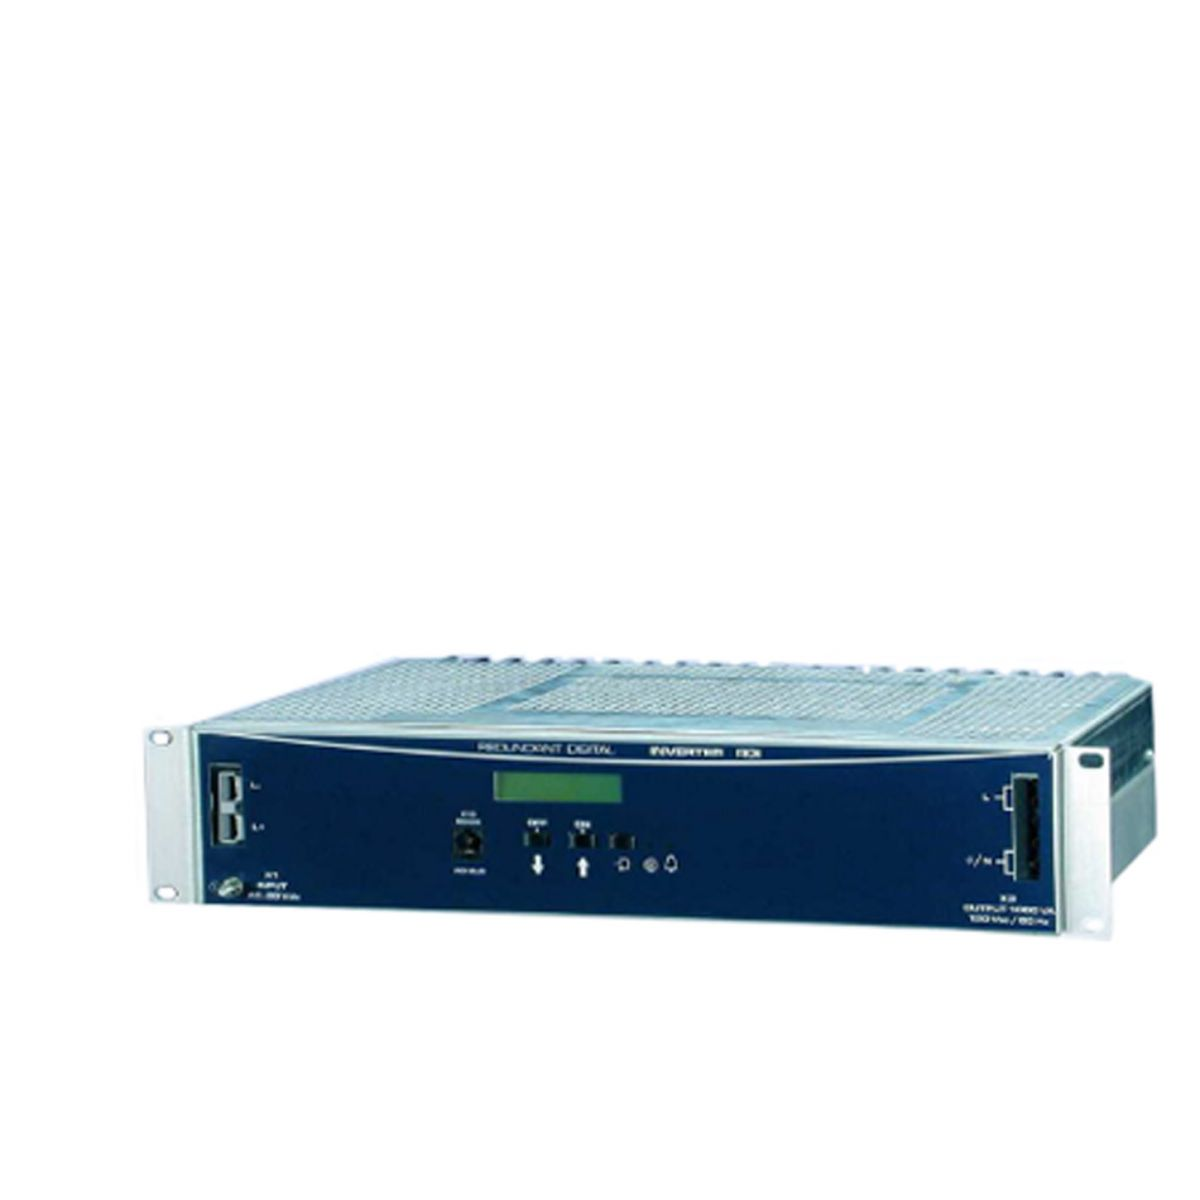 RDI 1000VA-48Vdc